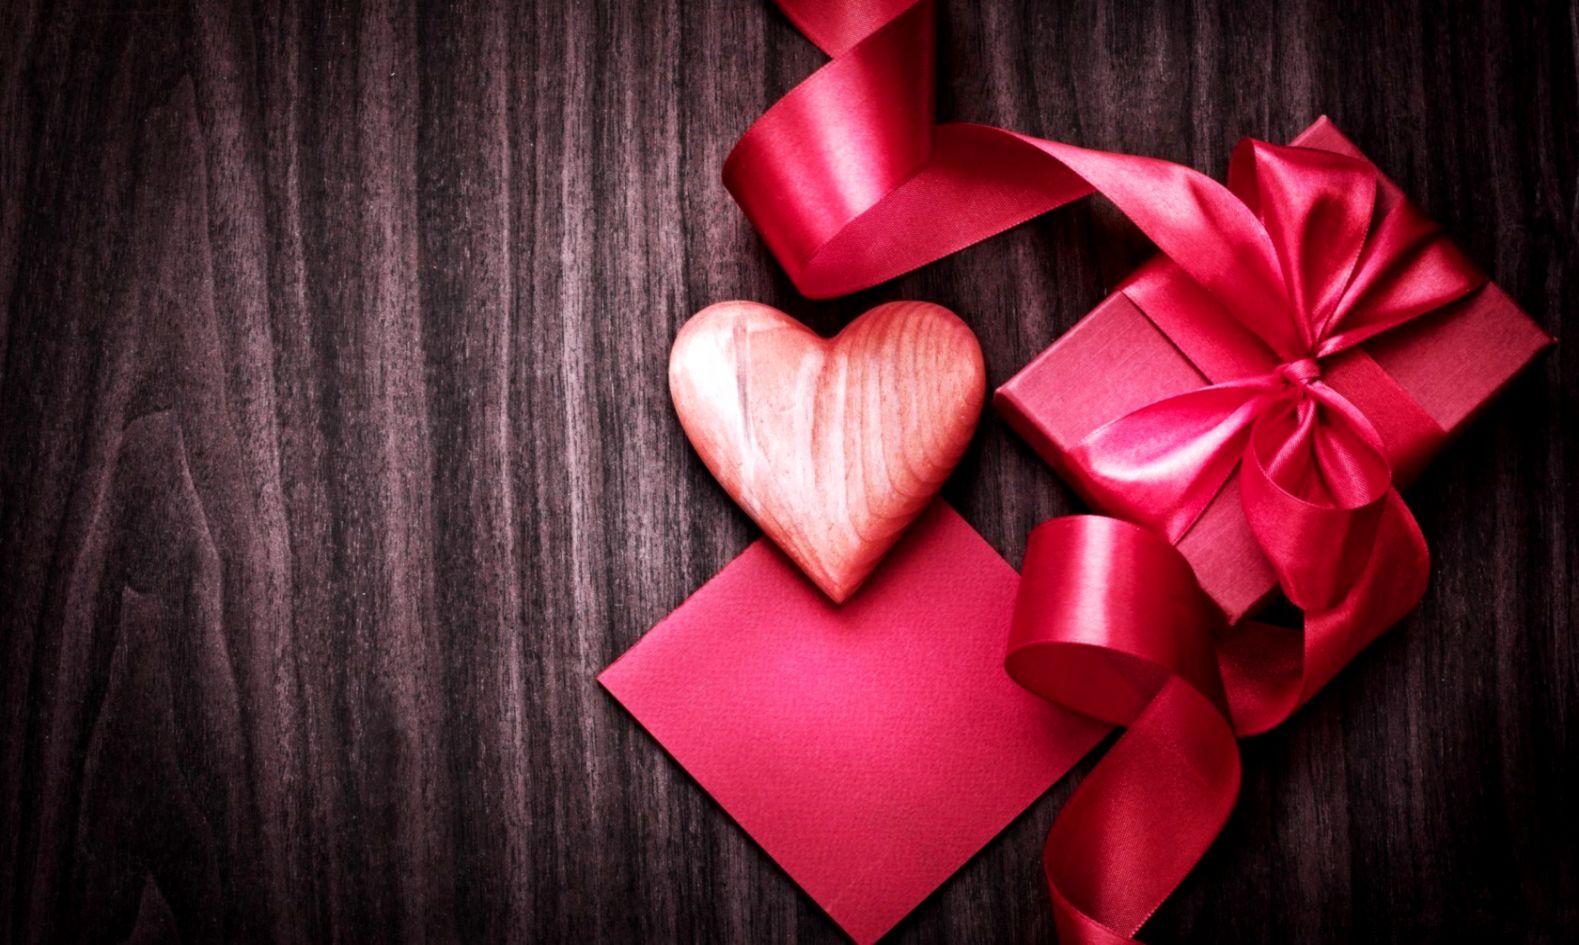 Love heart gift box ribbon pink hd wallpaper freehdwalls  Chainimage